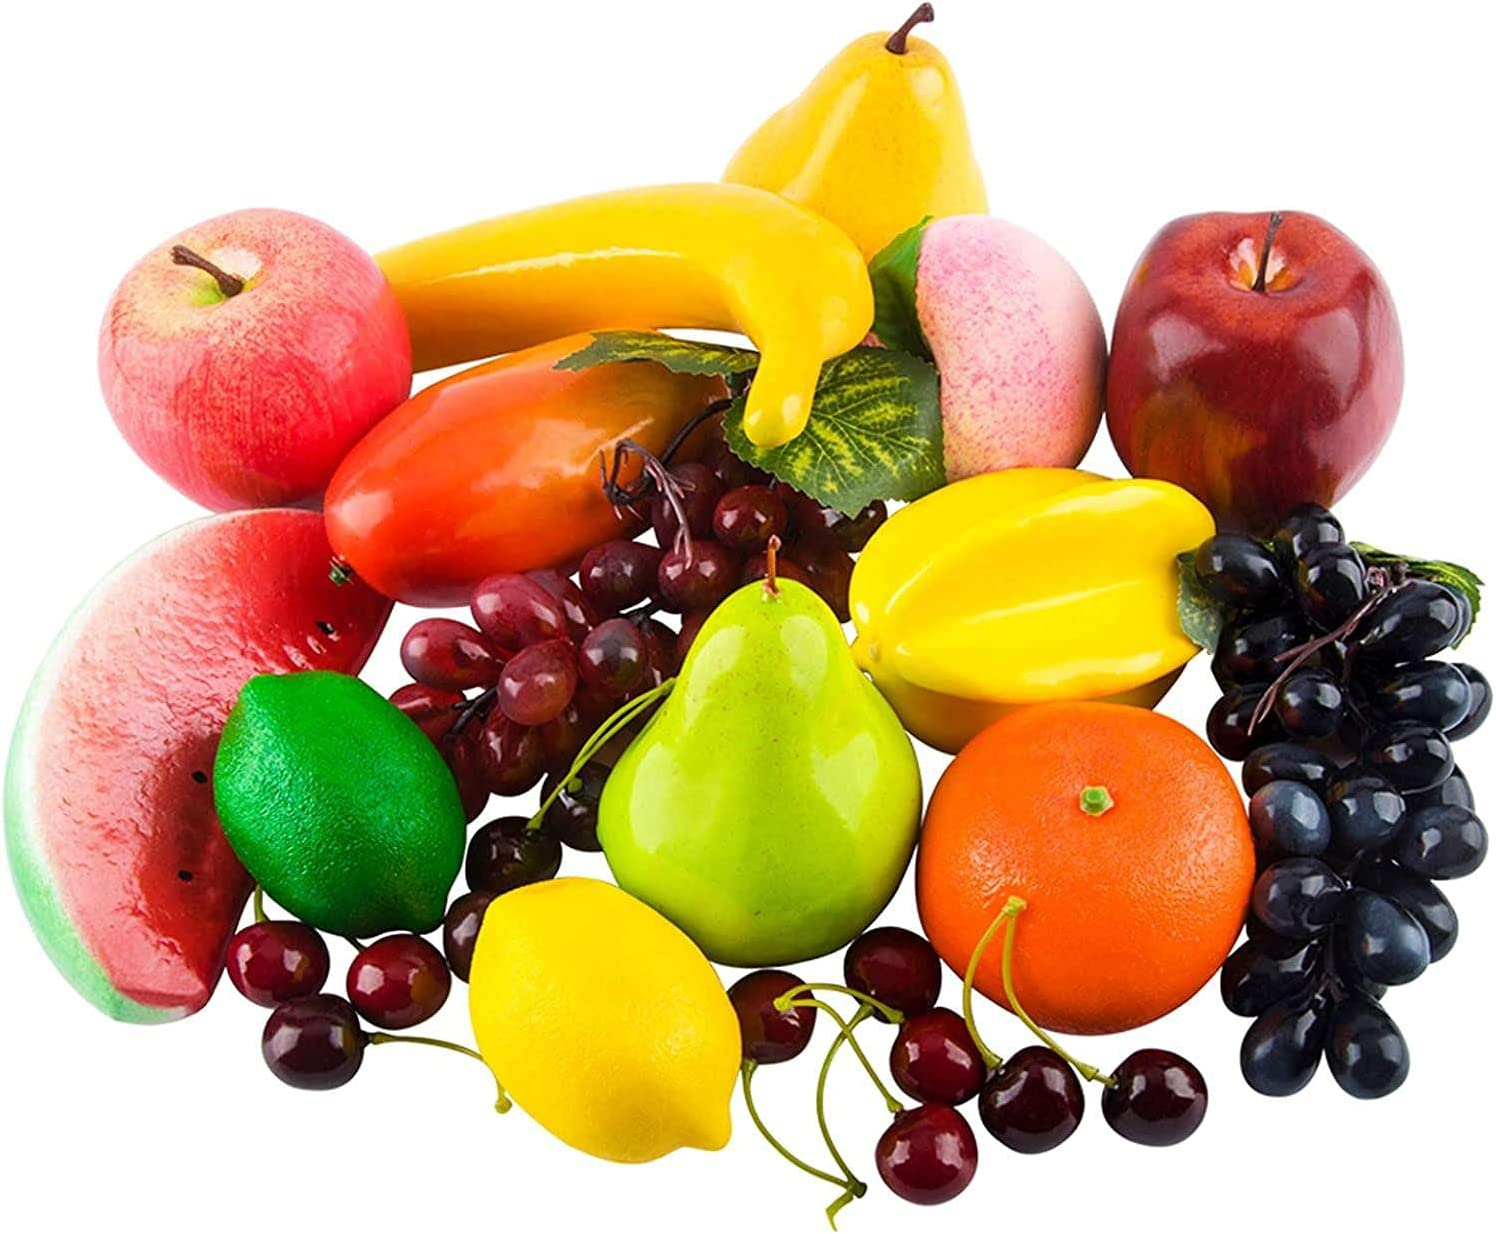 Popular standard 20 Pcs Artificial Long-awaited Fruits Assorted Lifelike Fruit Deco Realistic